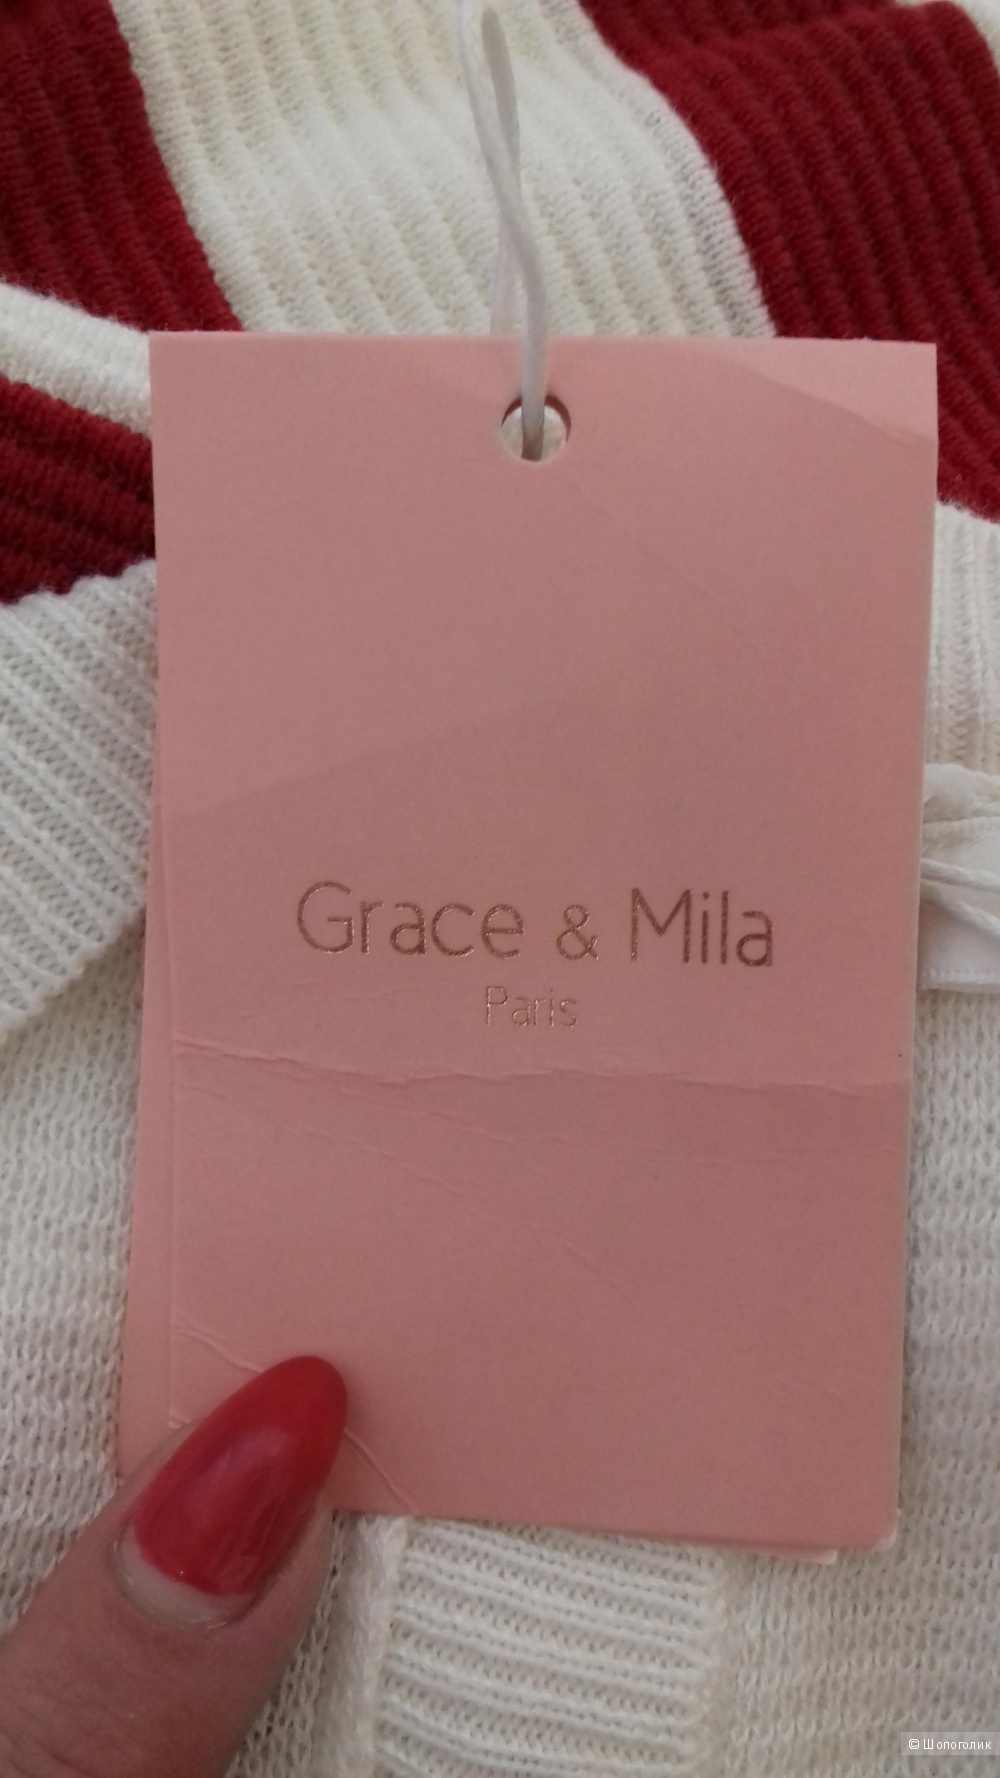 Джемпер GRACE & MILA, Paris, размер 42-44